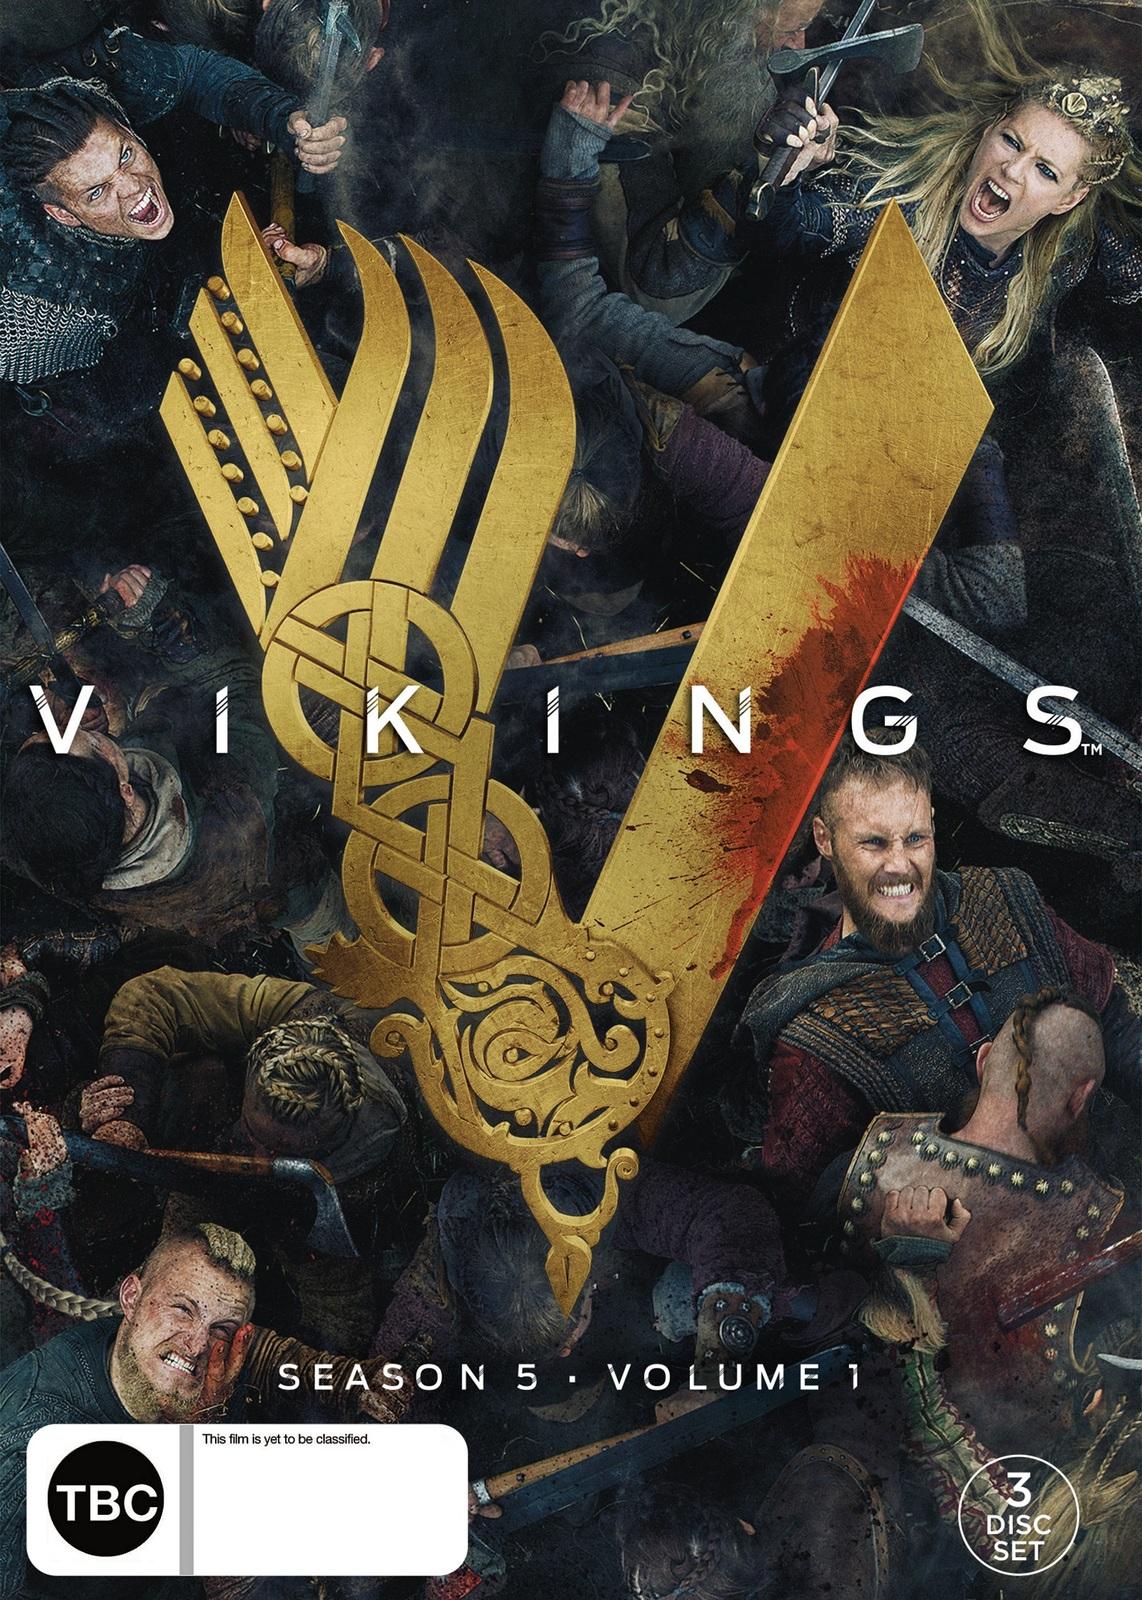 Vikings - Season 5 Volume 1 on DVD image